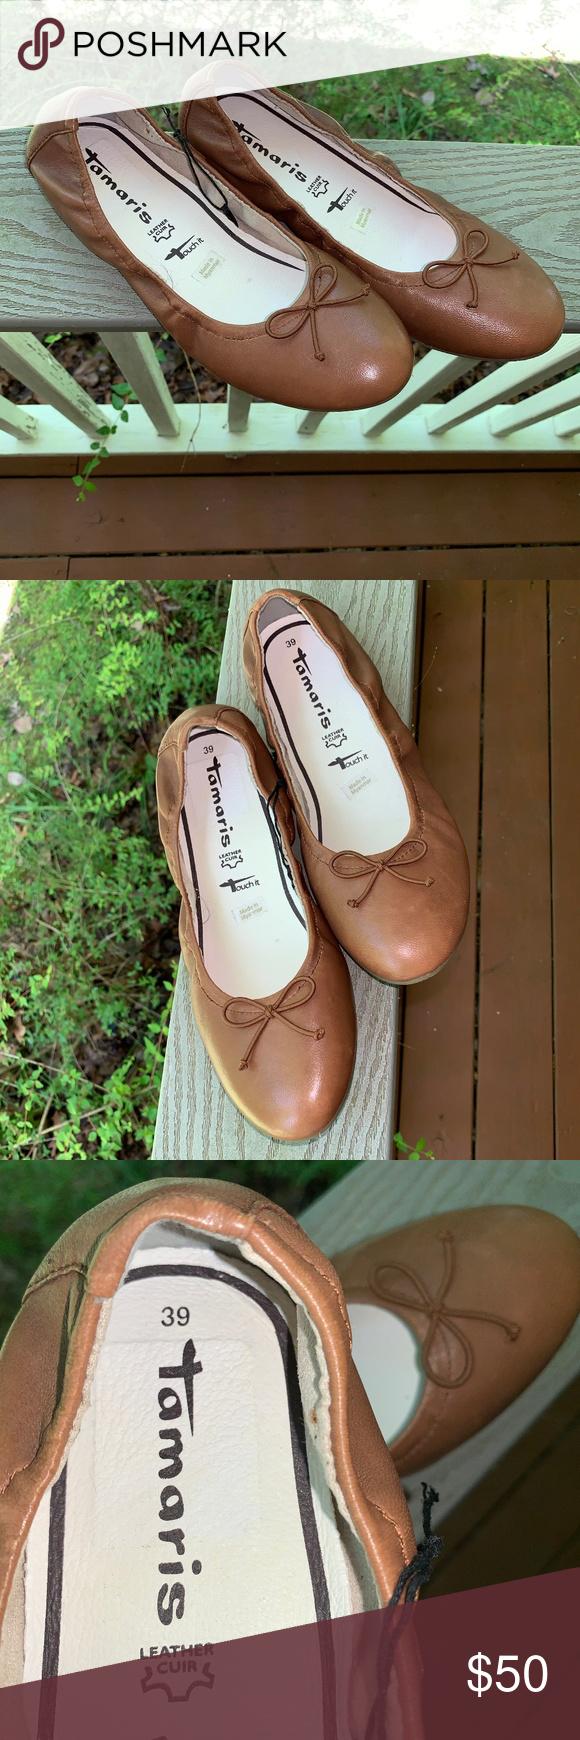 Tamaris 39 Ballet Flats Leather Memory Foam NEW